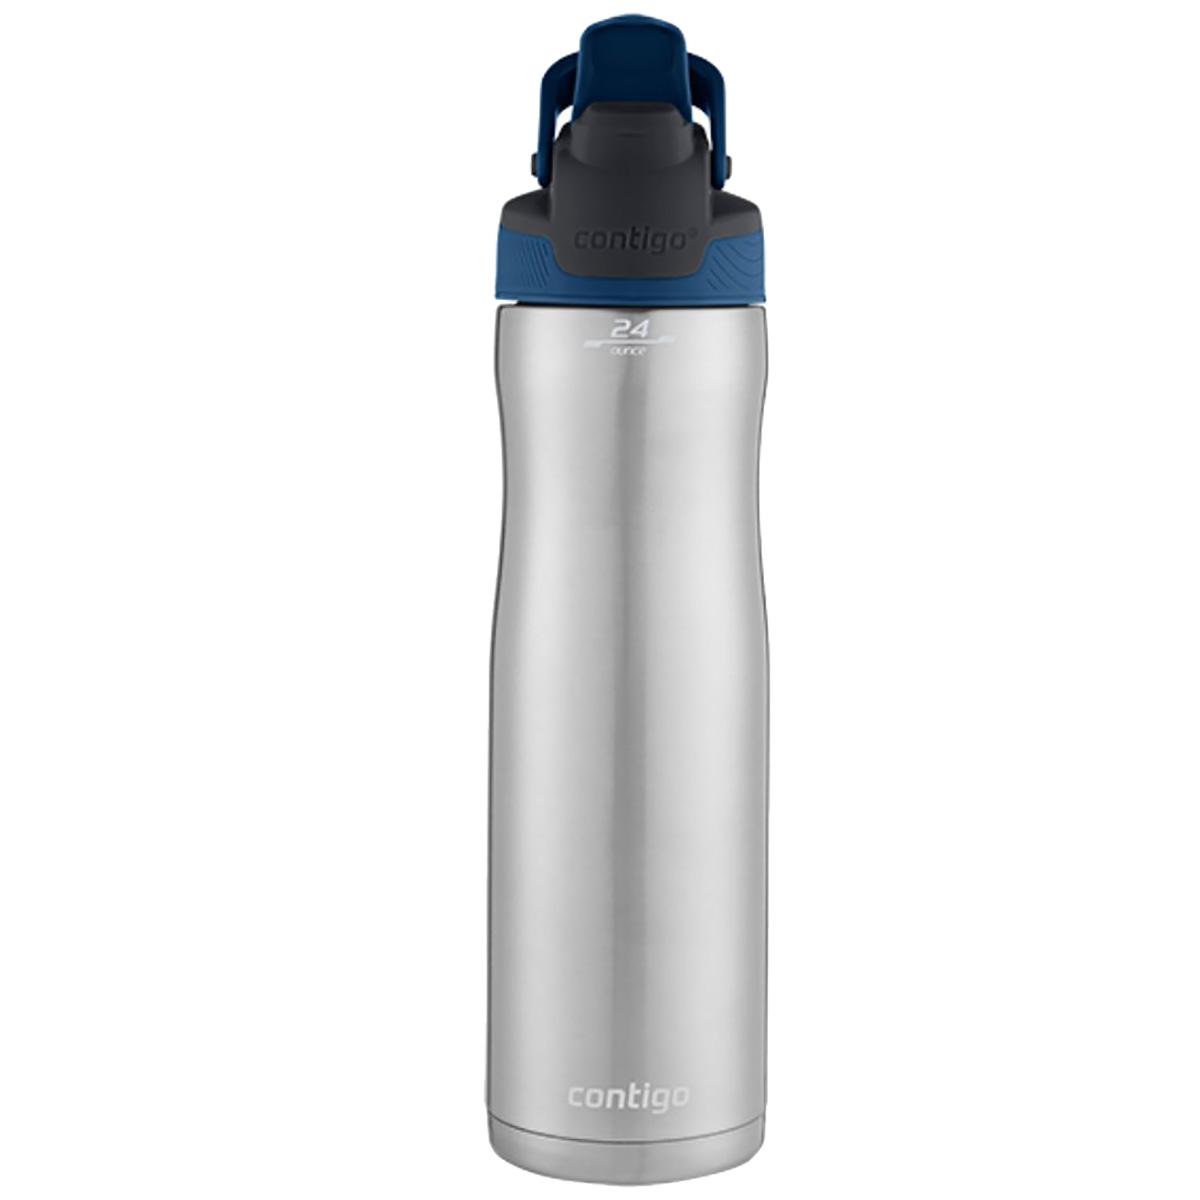 Contigo-24-oz-Chill-Autoseal-Stainless-Steel-Water-Bottle thumbnail 22